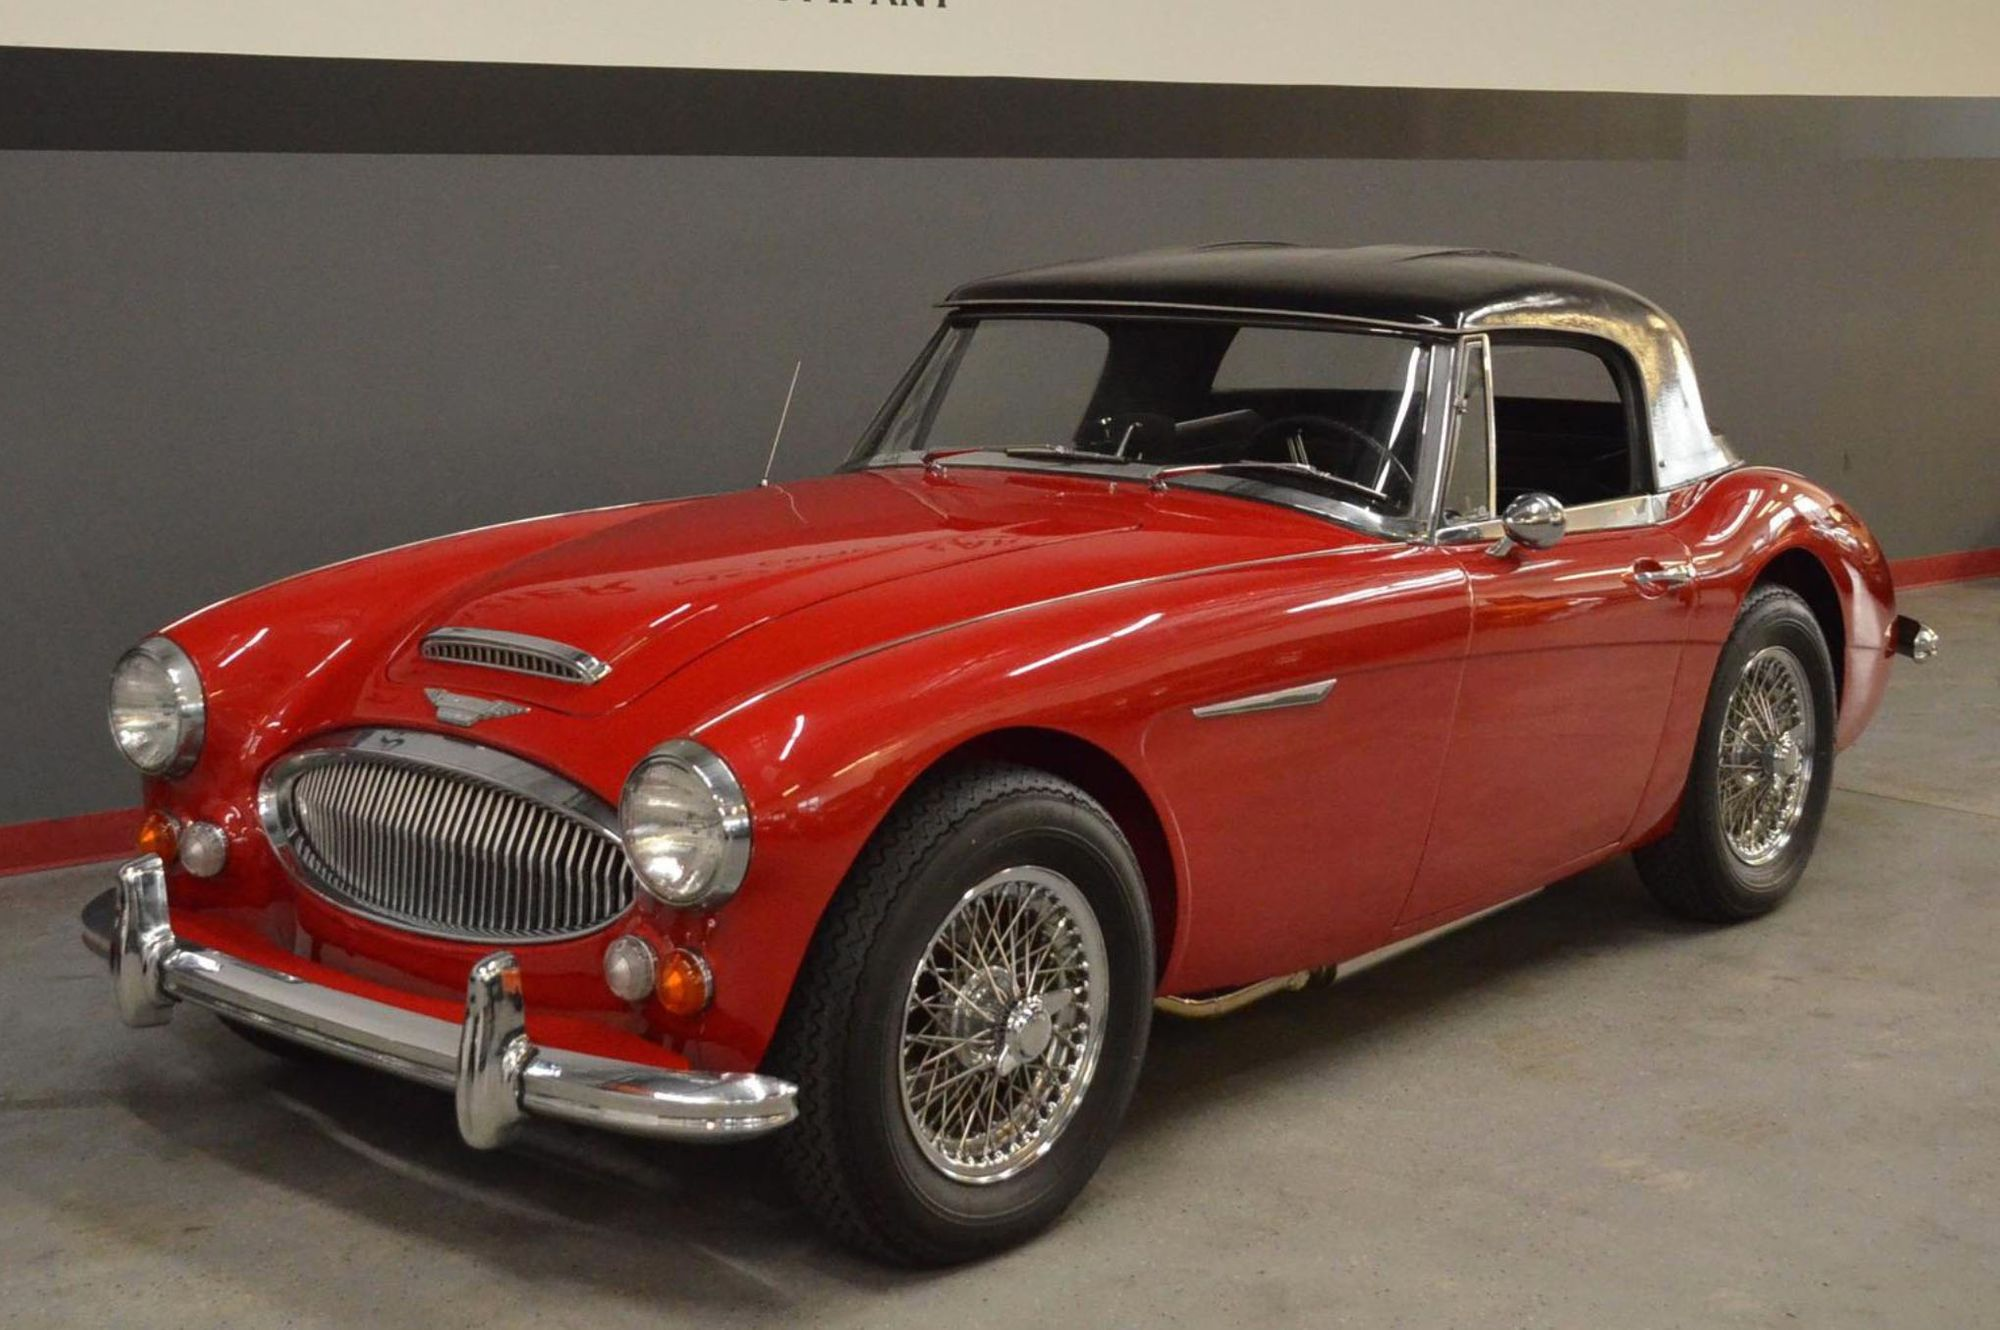 "<img src=""1962-austin-healey.jpg"" alt=""An all-original 1967 Austin-Healey 3000 BJ8"">"